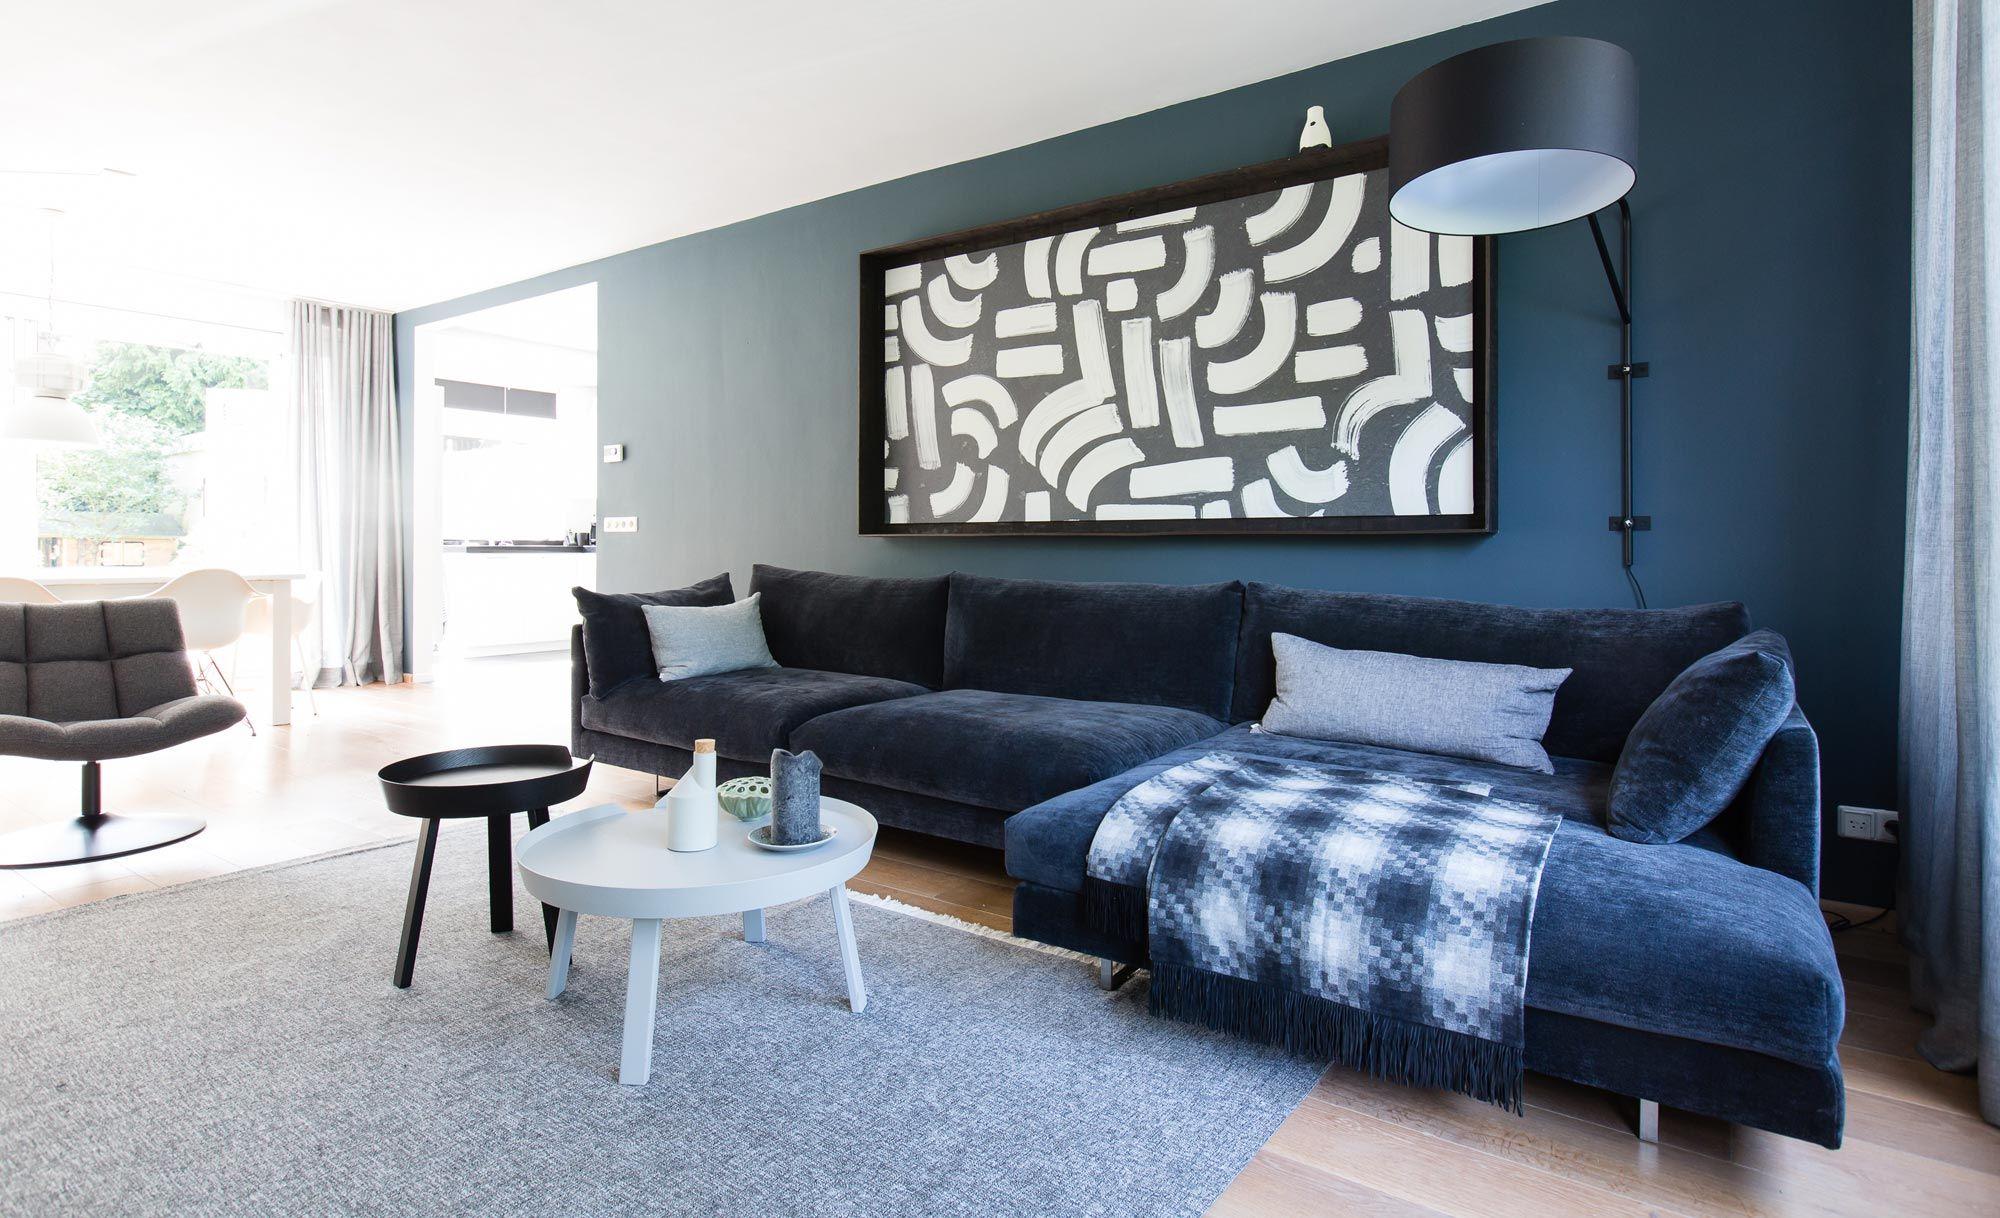 Woonkamer Ideeen Vtwonen : Woon ideeen woonkamer trendy interieur woon ideeen woonkamer